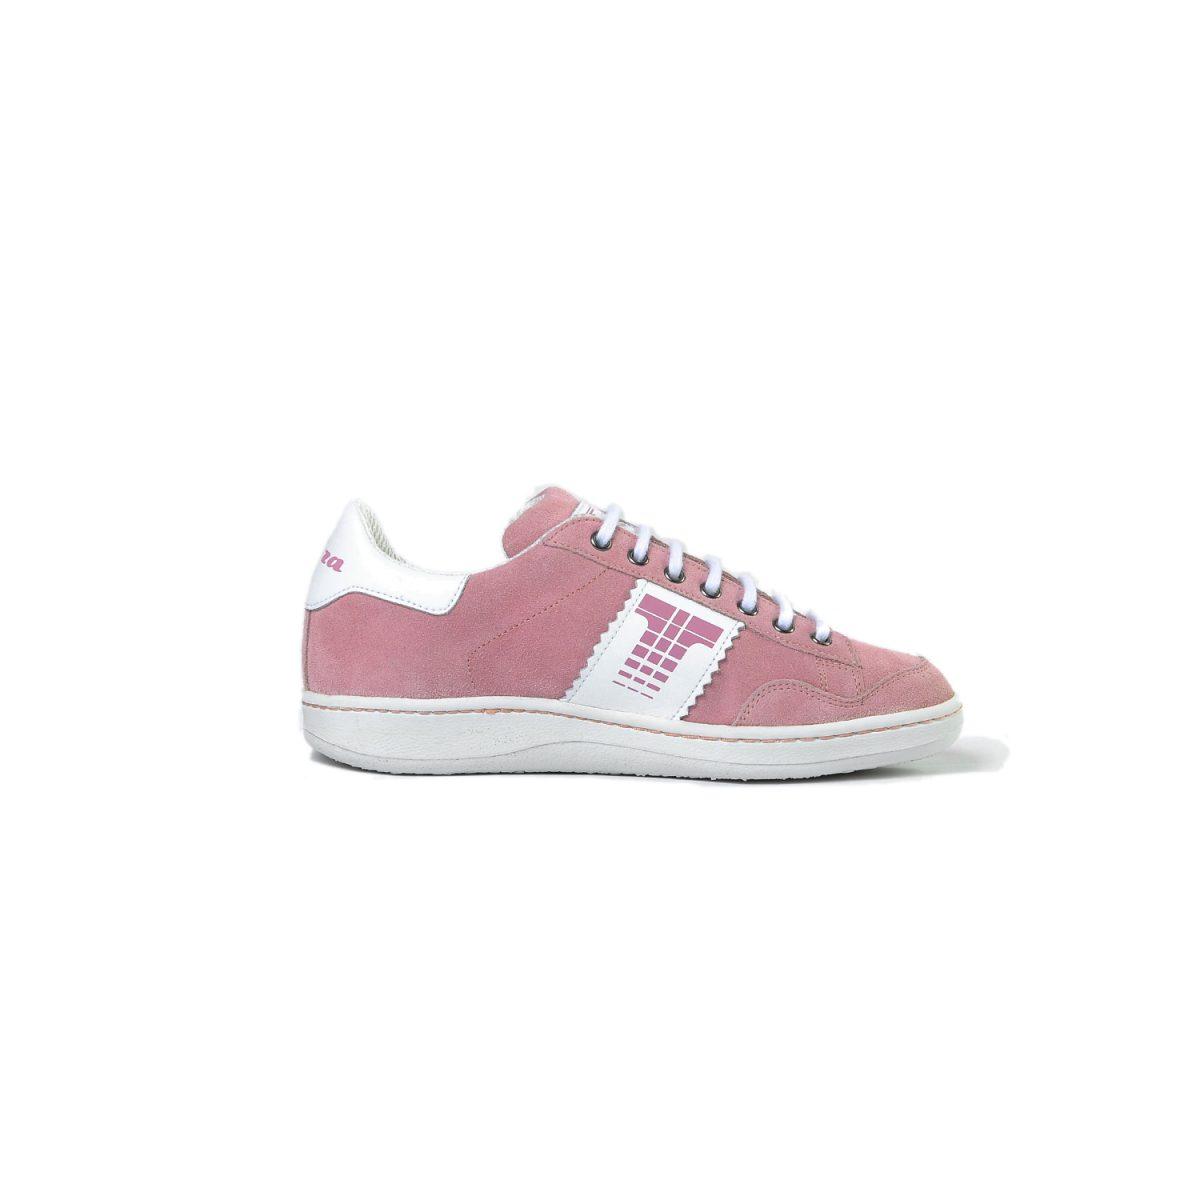 Tisza shoes - Derby - Powder-white